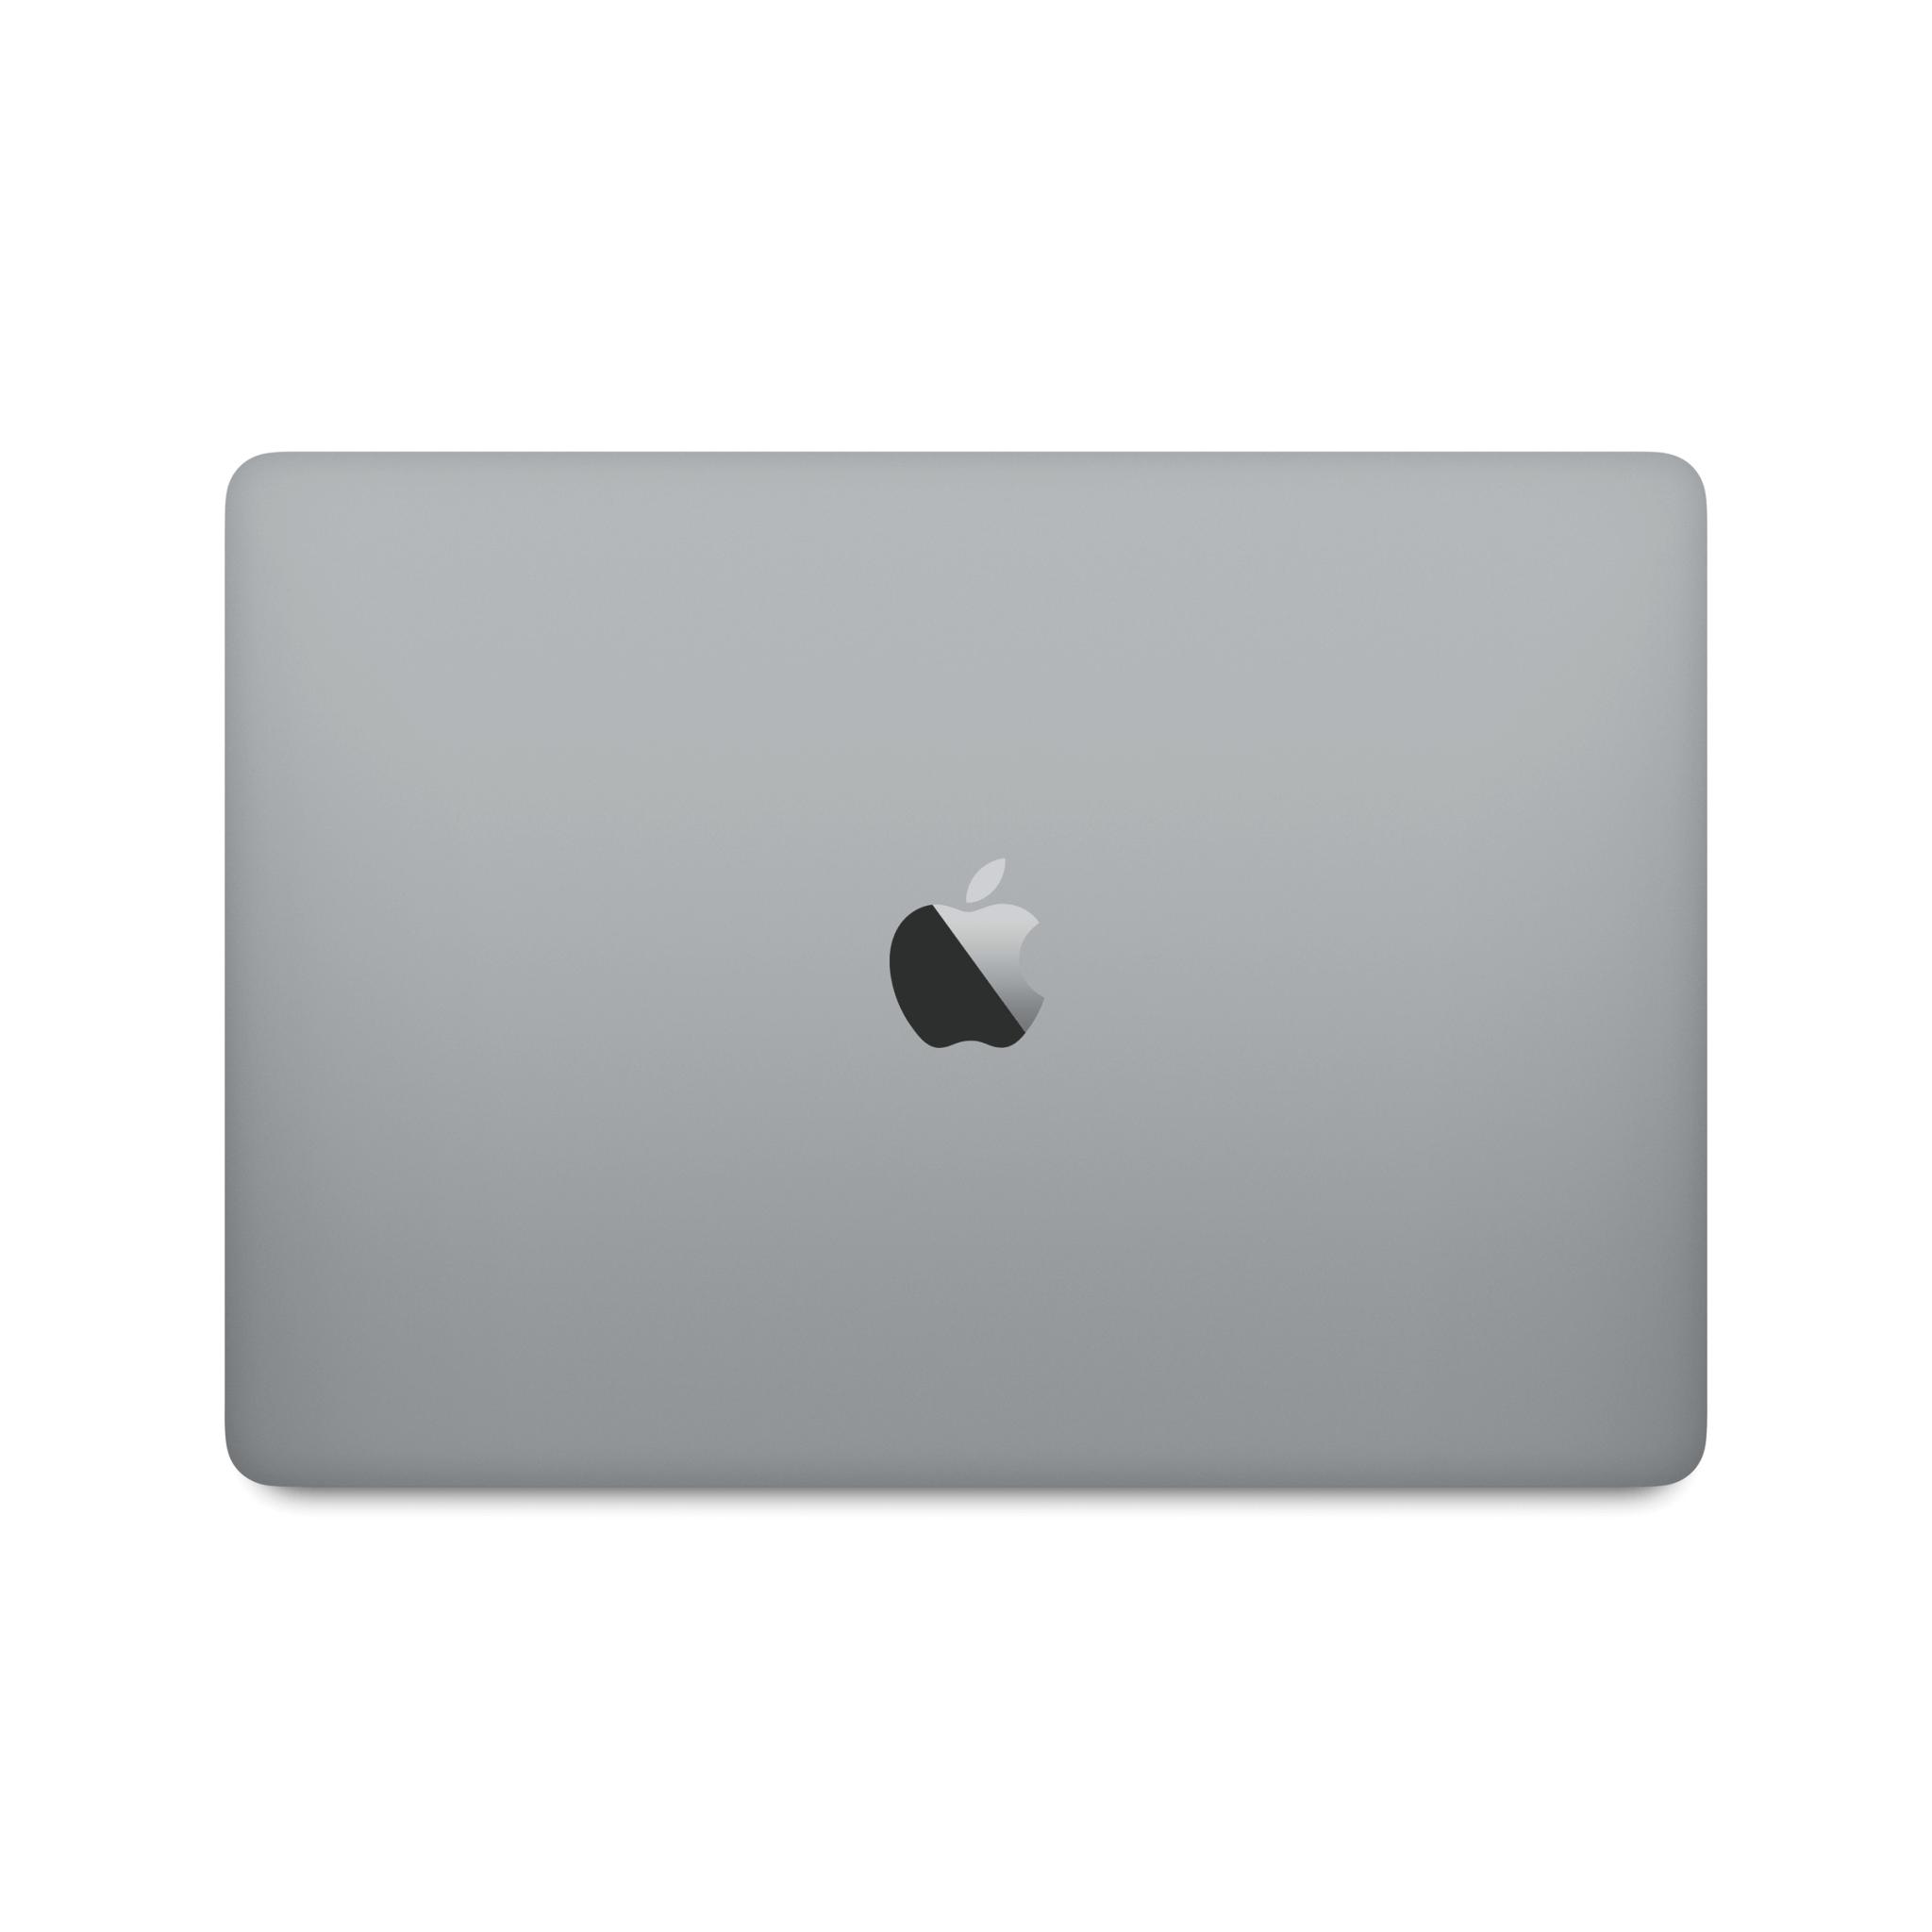 MacBook Pro 2016 mit 13-Zoll-Display ind Space Grau (Bildrechte: Apple)